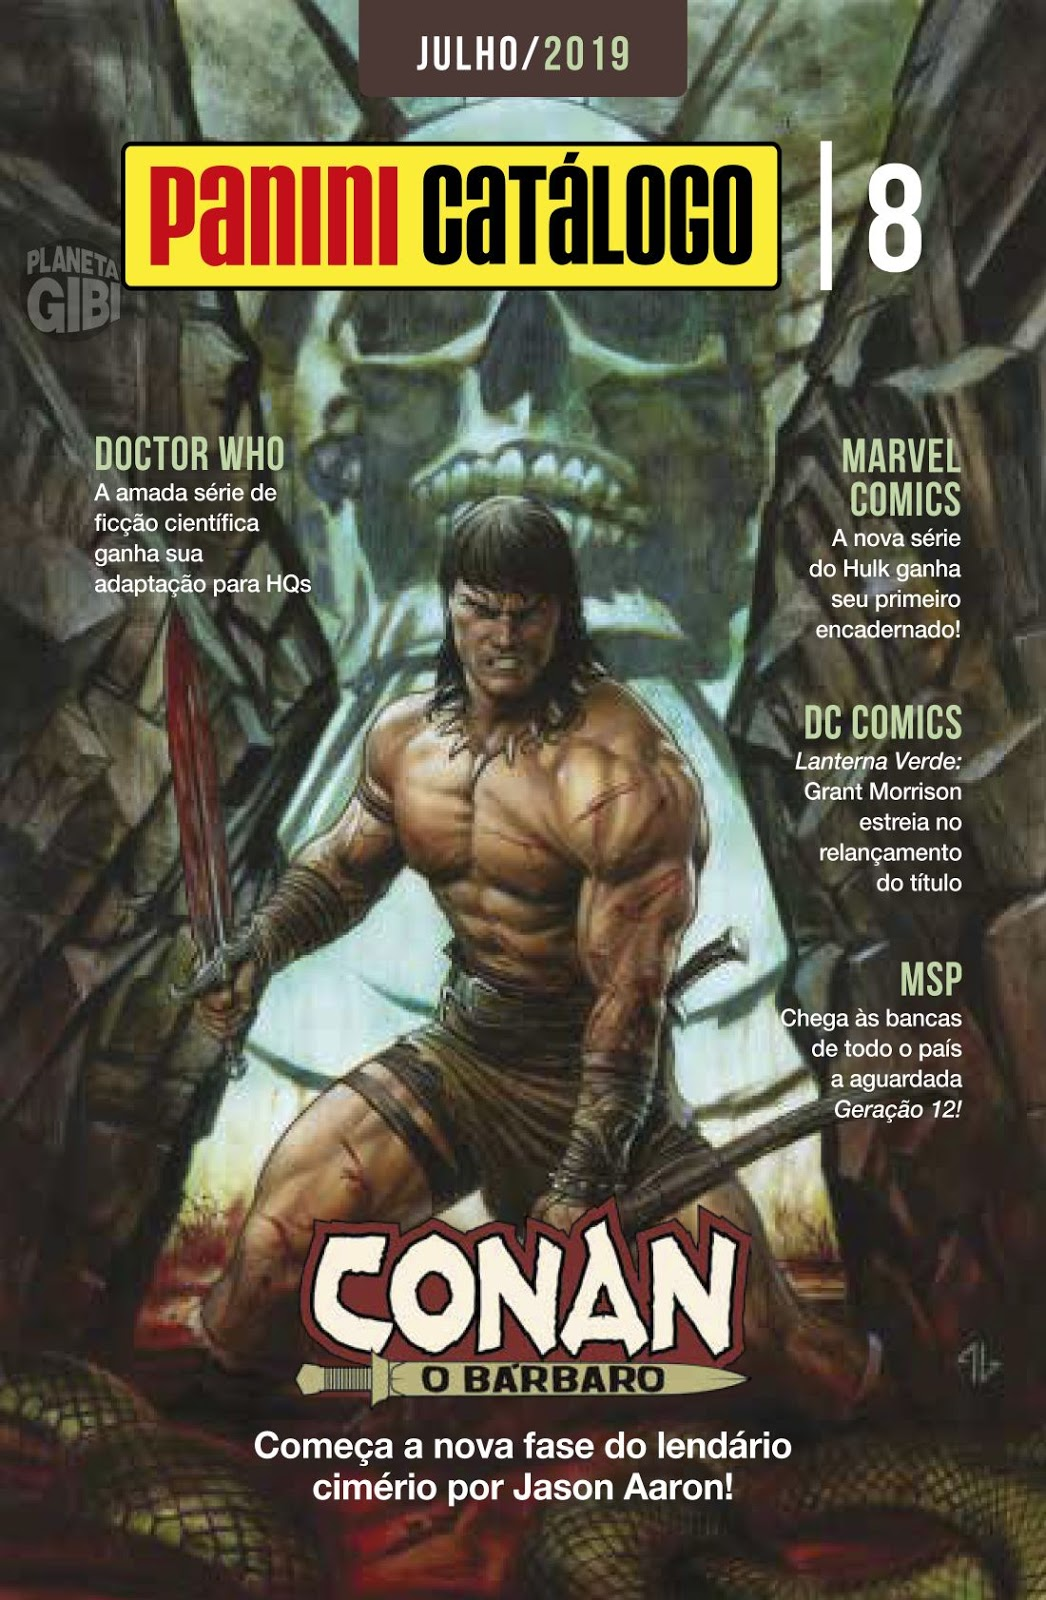 Novidades Panini Comics - Página 22 Catalogo_08_jul19_P%25C3%25A1gina_01